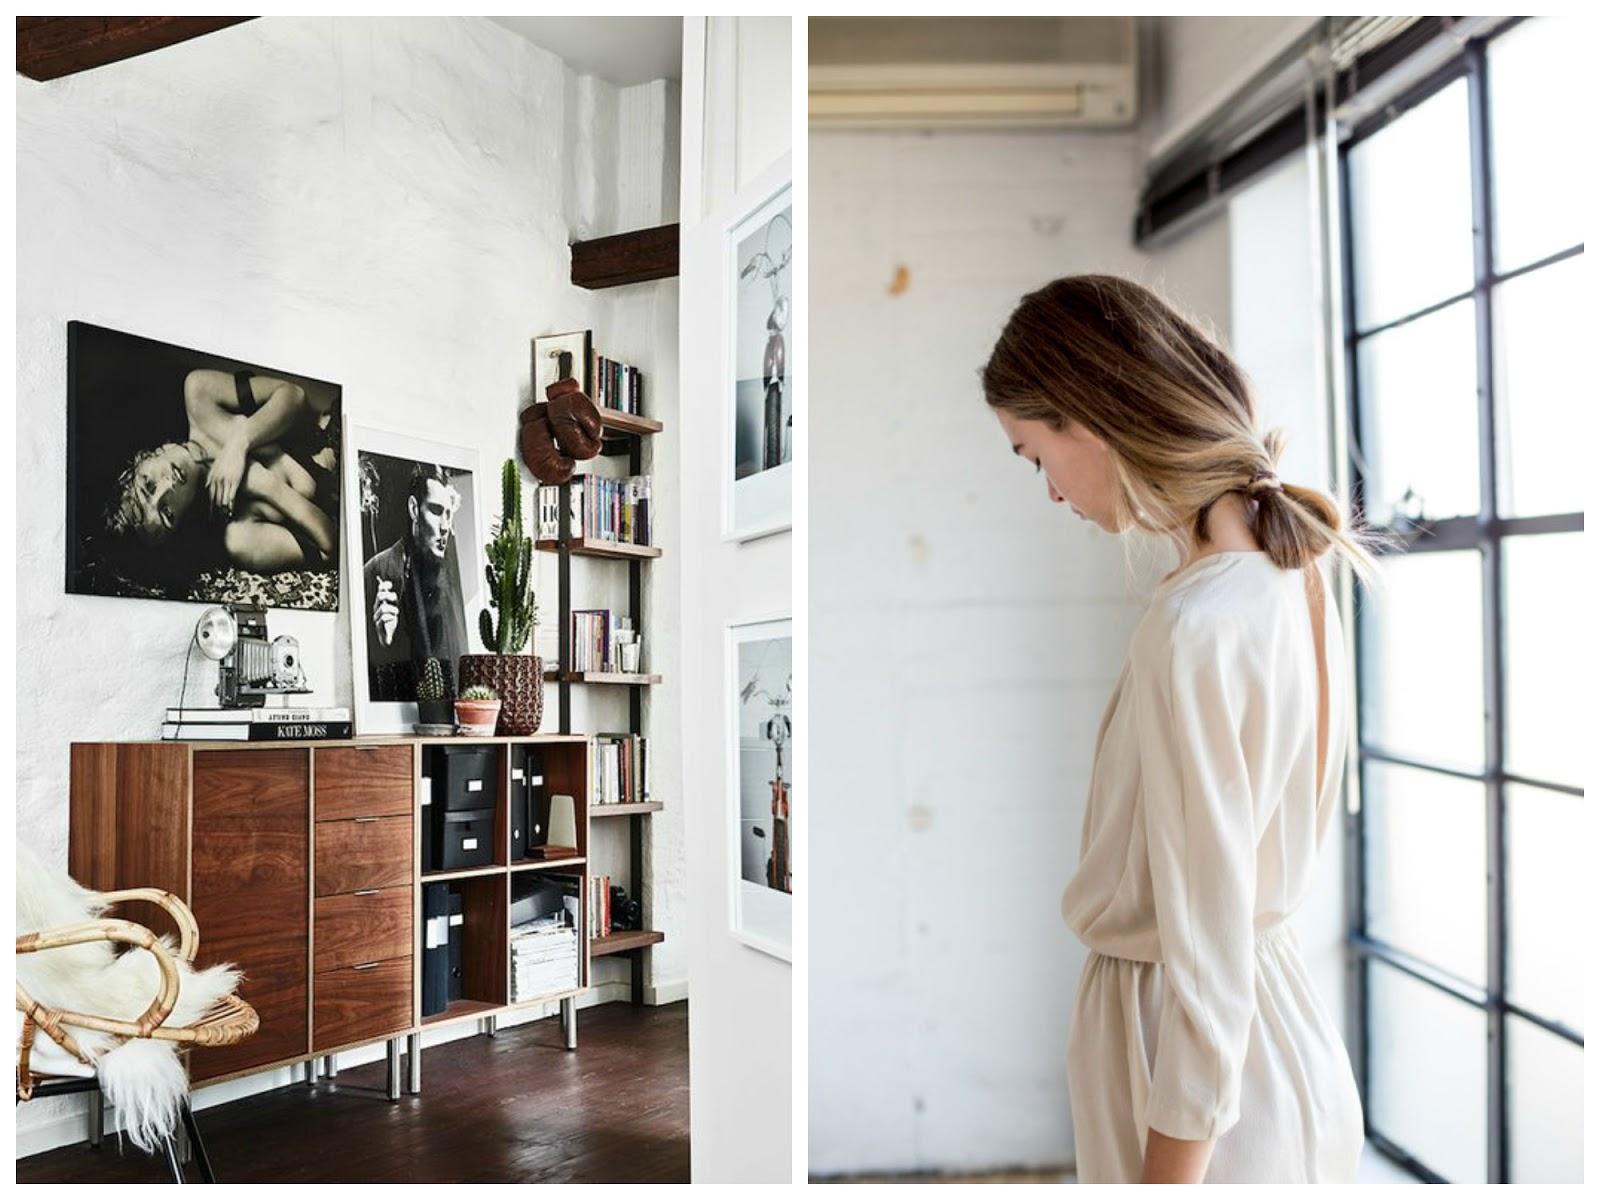 Alina Ermilova | Home